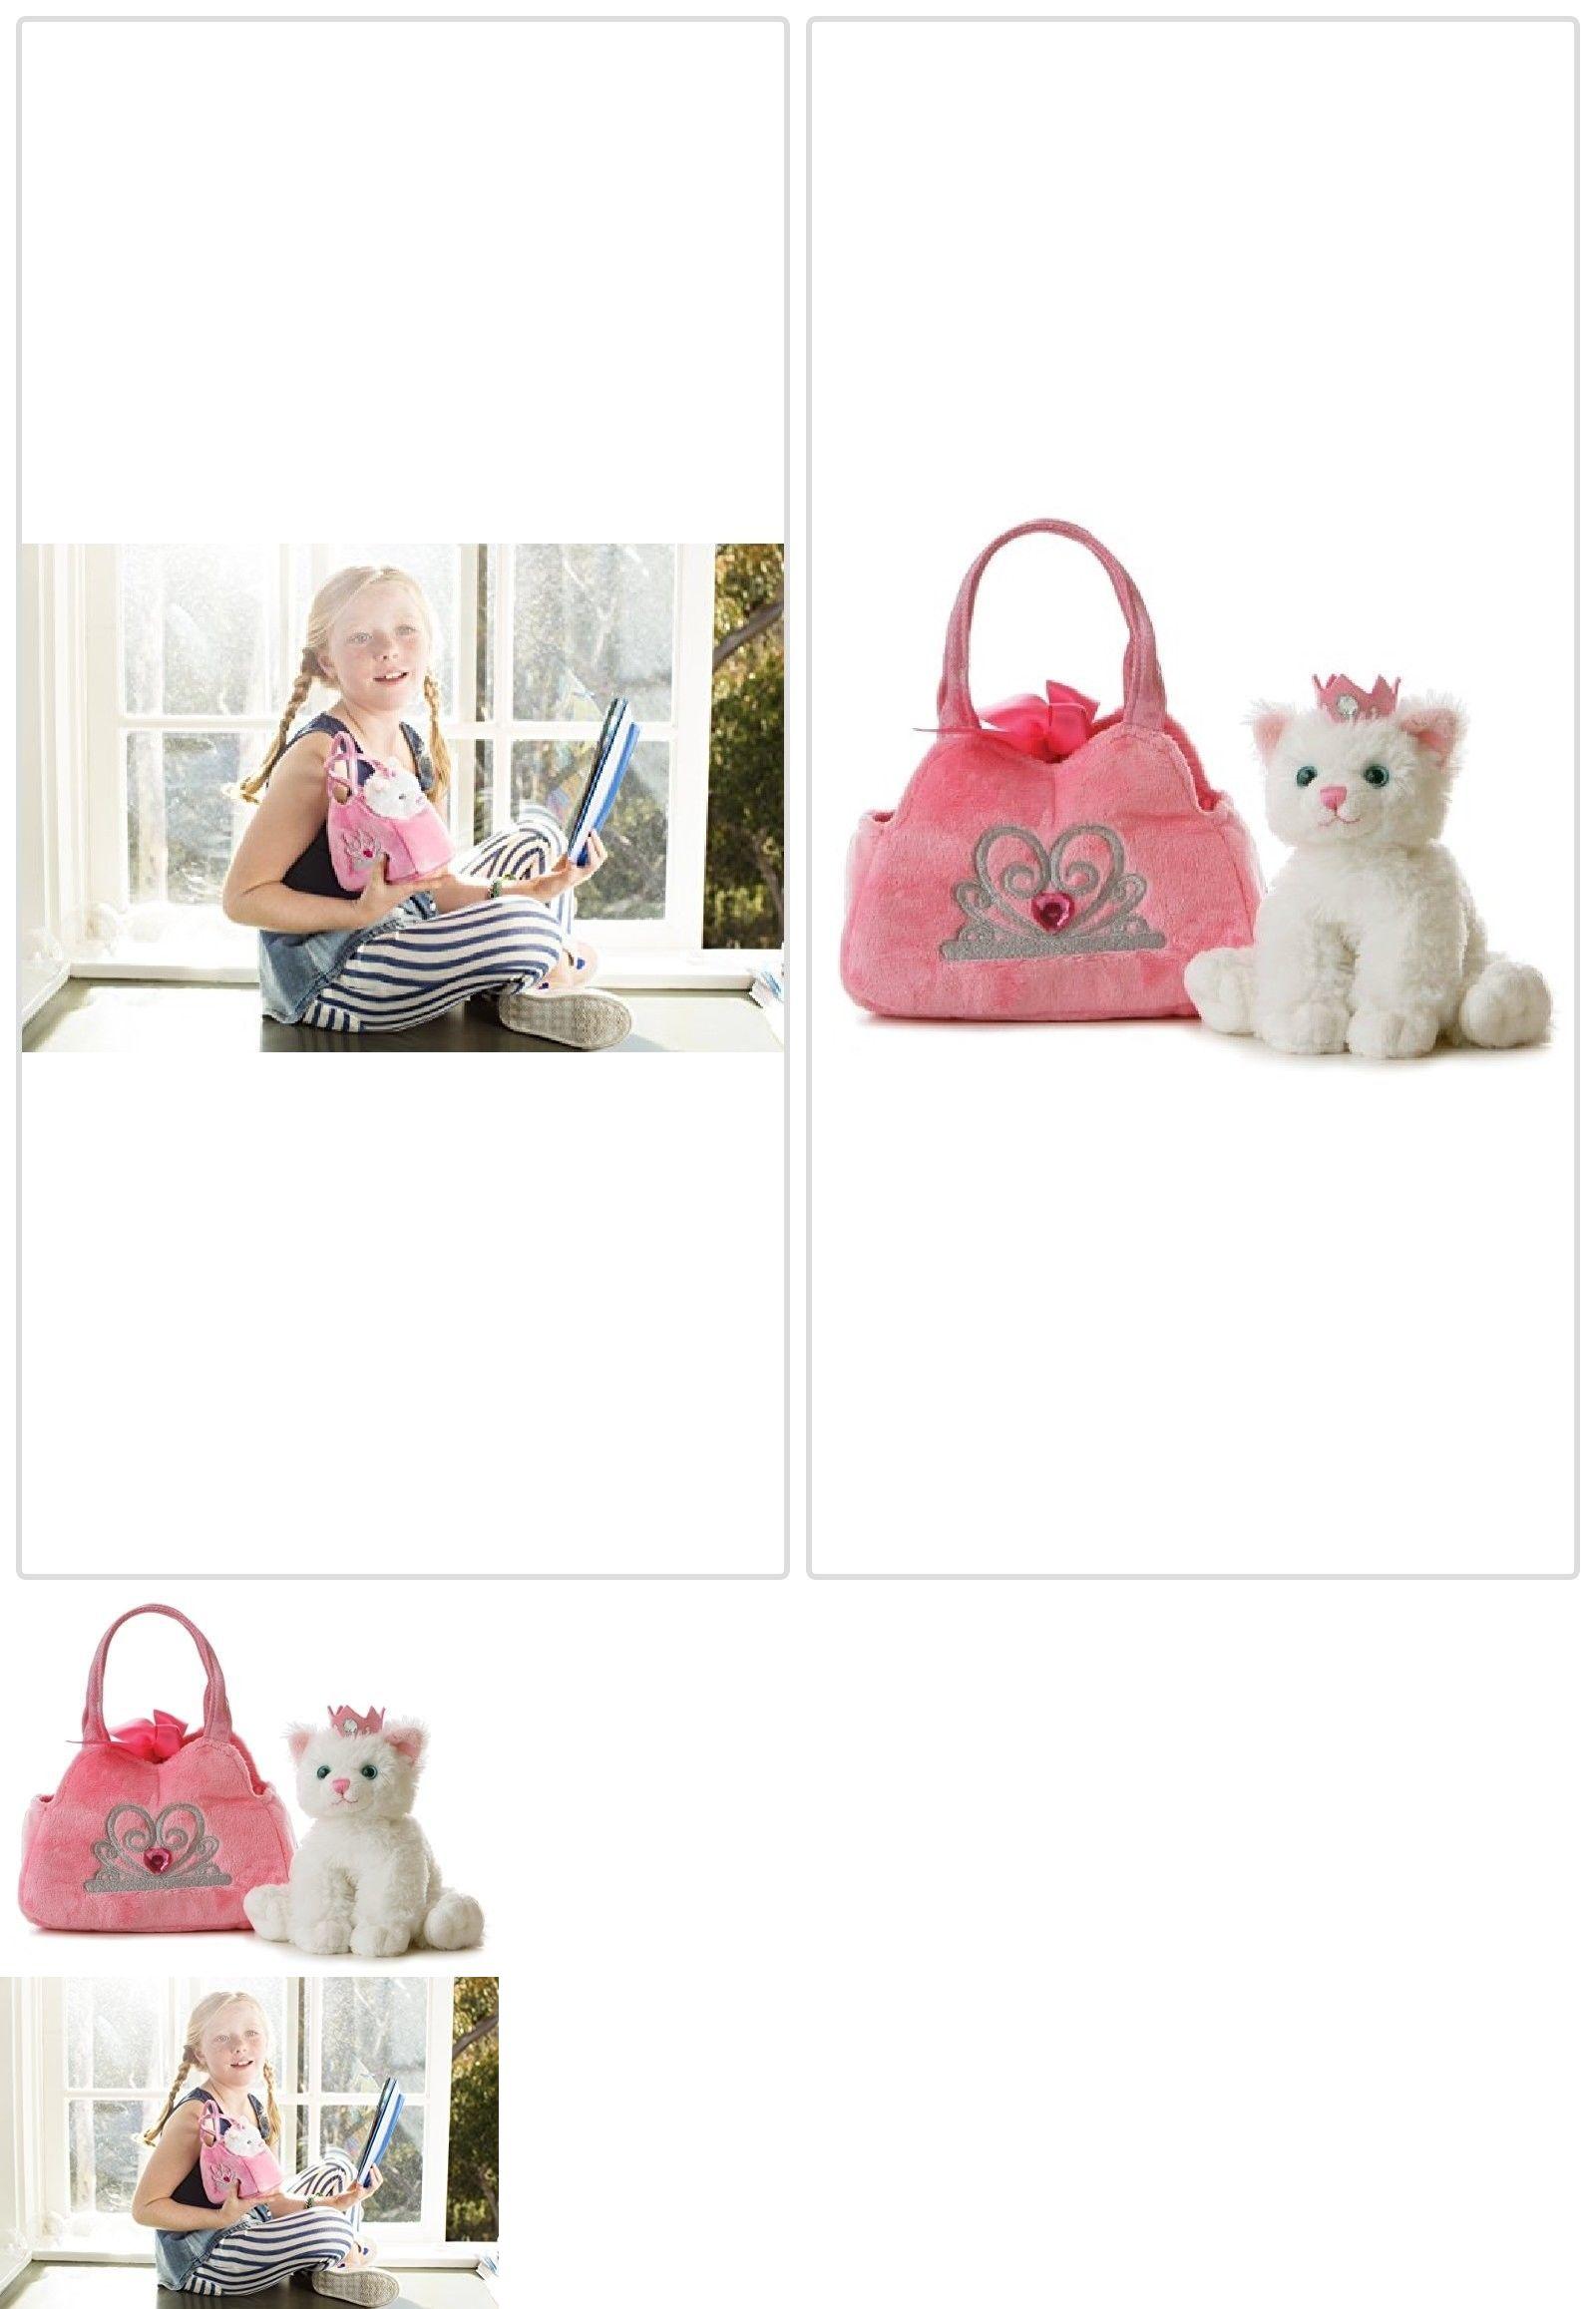 Aurora 158789 Aurora World Fancy Pals Plush Princess Kitten Purse Pet Carrier Buy It Now Only 12 28 On Ebay Auror Pet Carrier Purse Pet Carriers Kitten